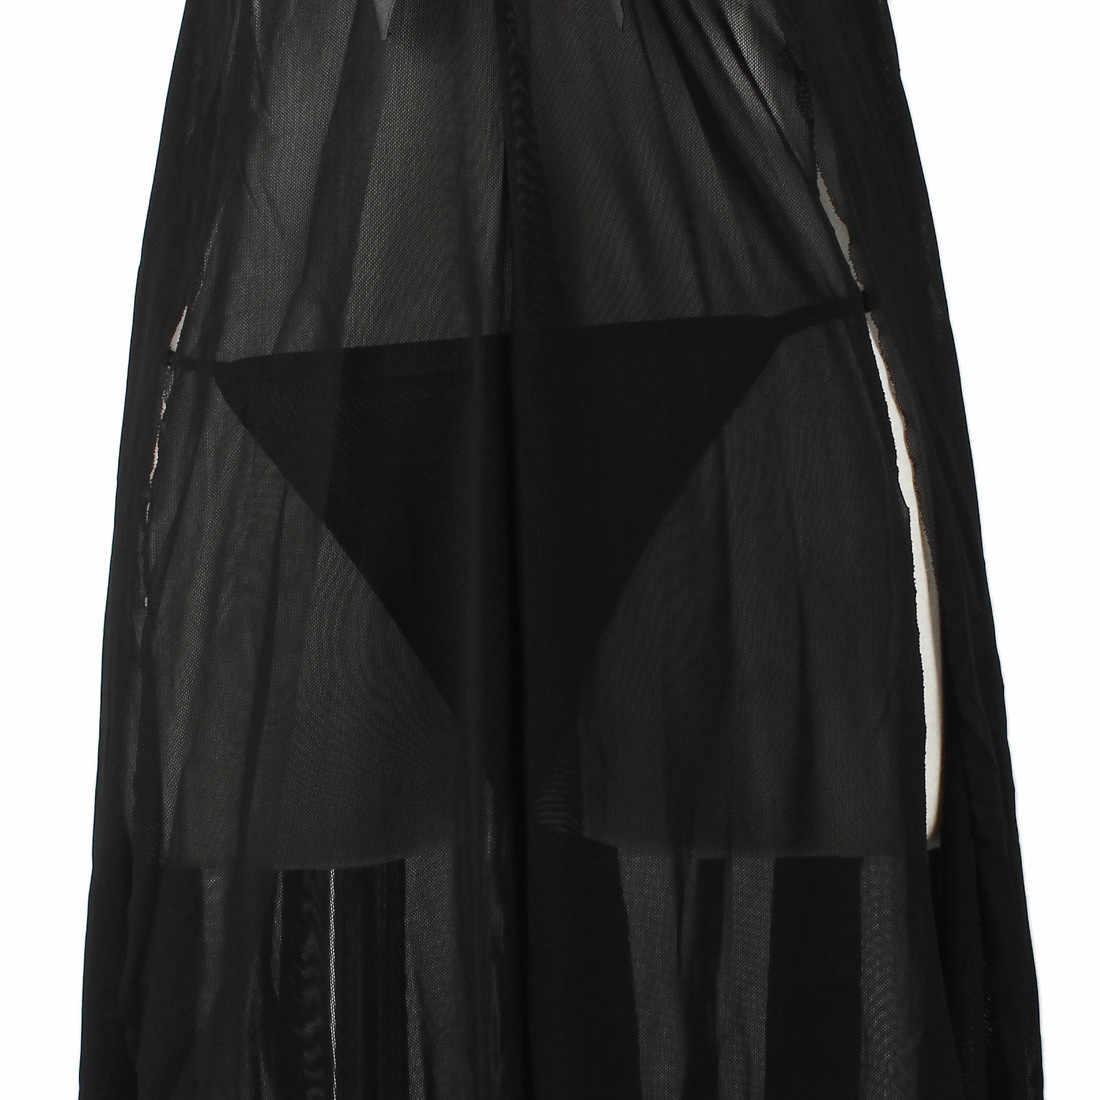 TELOTUNY Baru Sexy Pakaian Dalam Wanita Pakaian Dalam Baju Tidur Renda Gaun G-string Baju Tidur Set Satu Potong Transparan Bodysuit Suit 1101